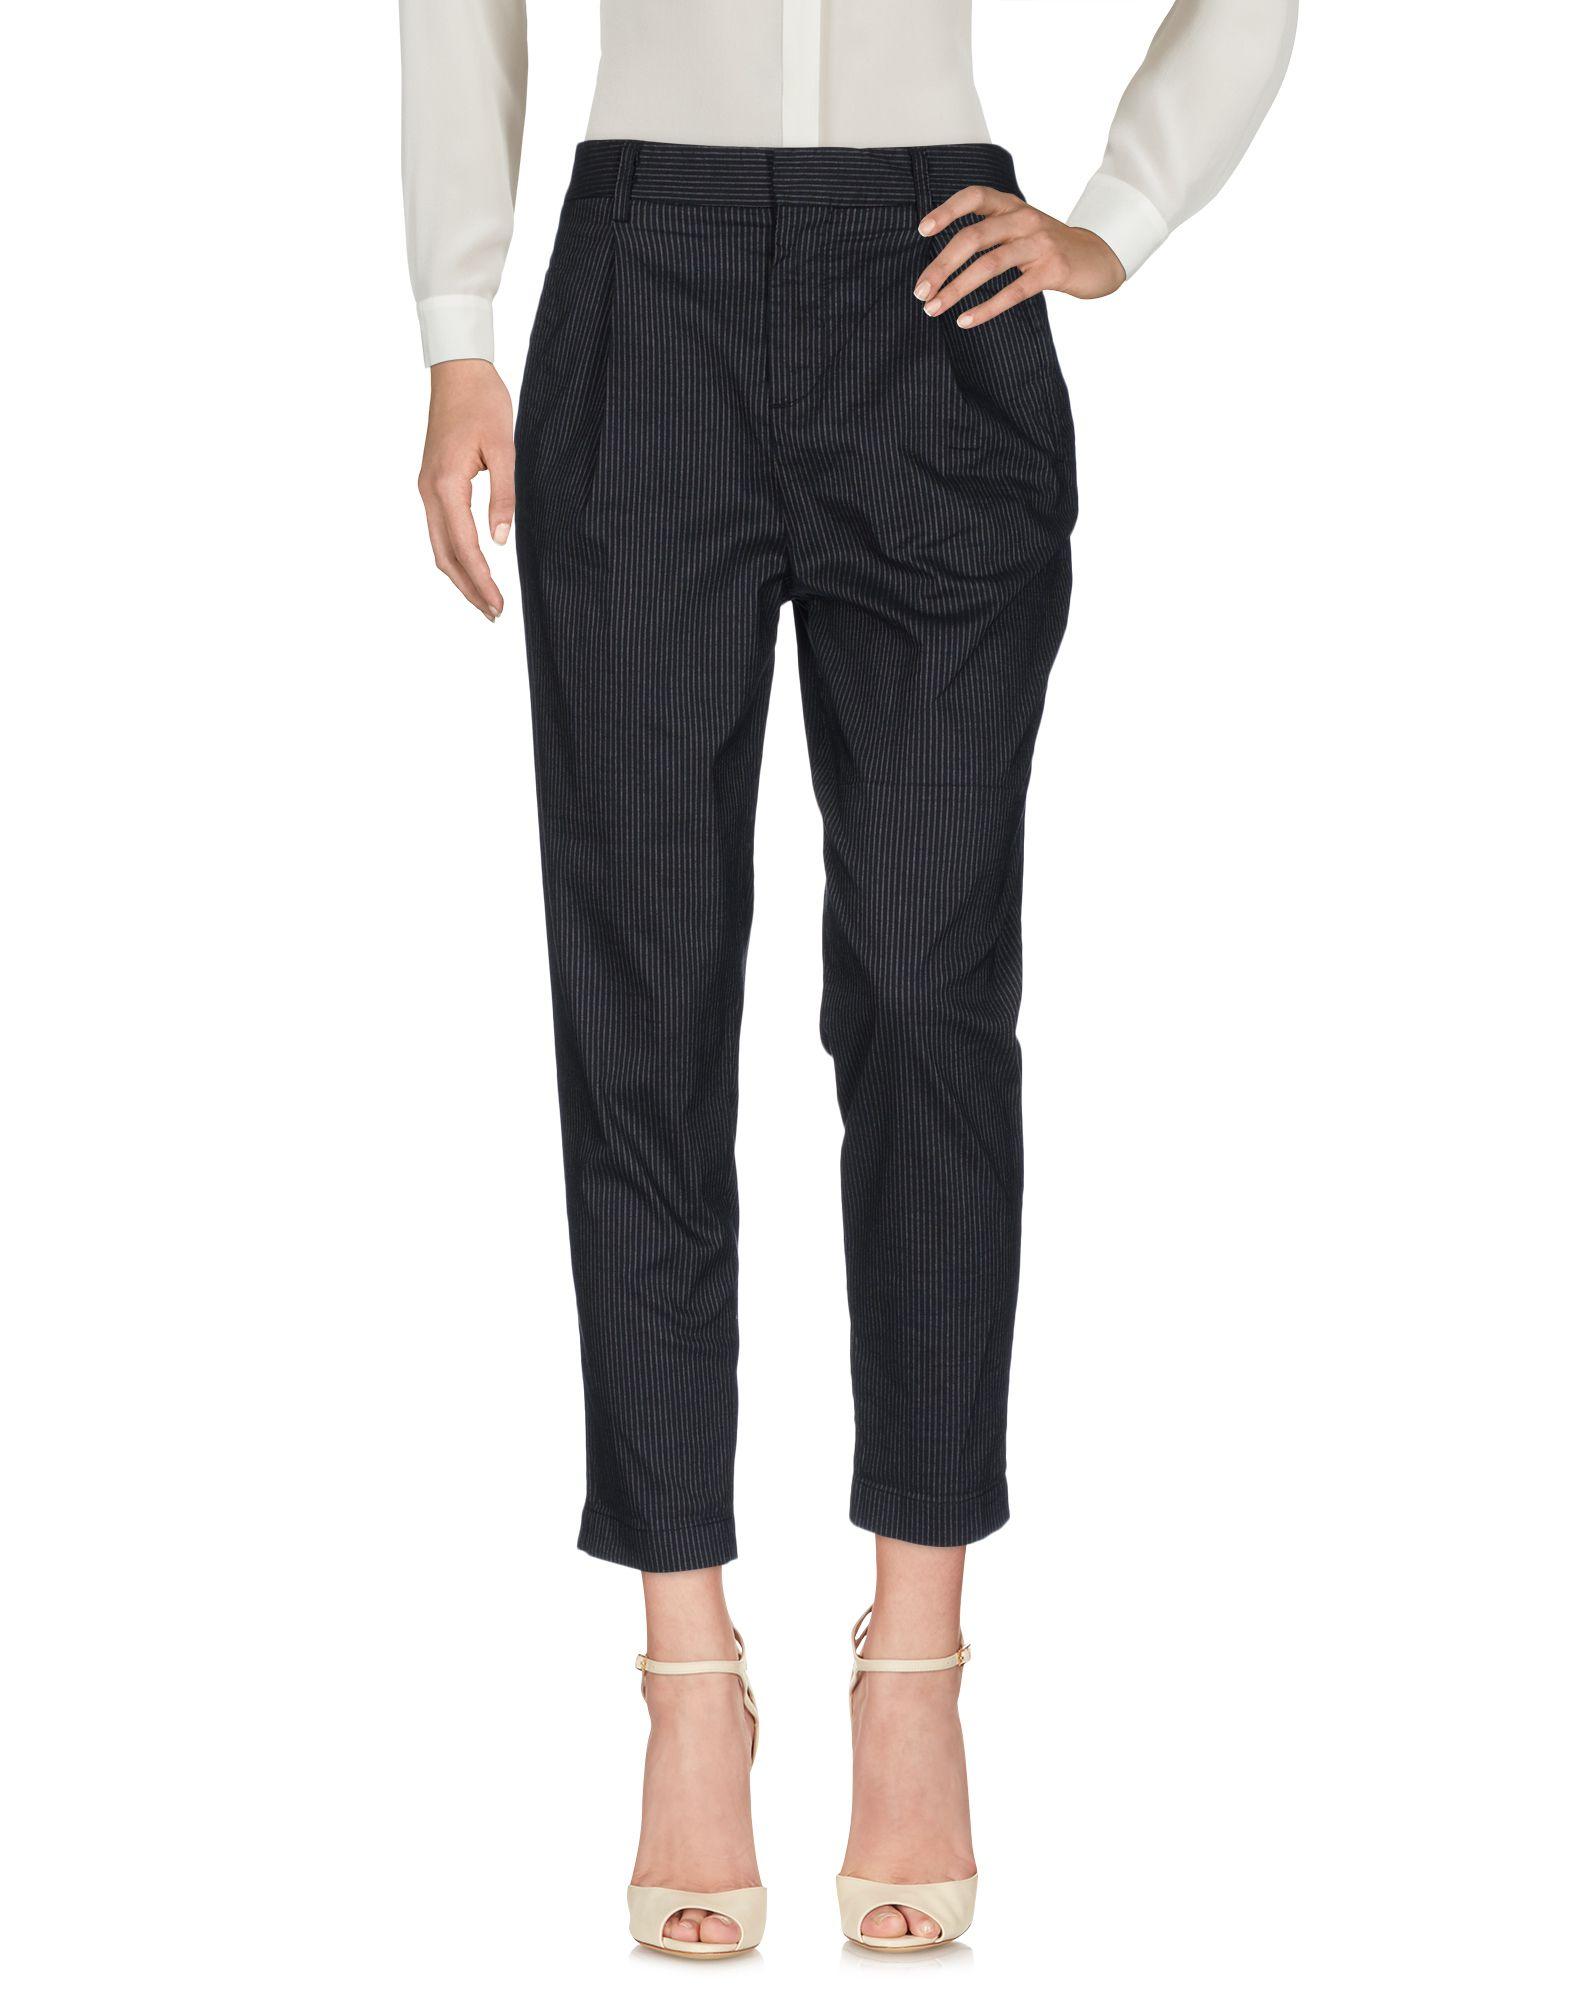 Pantalone Barena Donna - Acquista online su WJD7sb